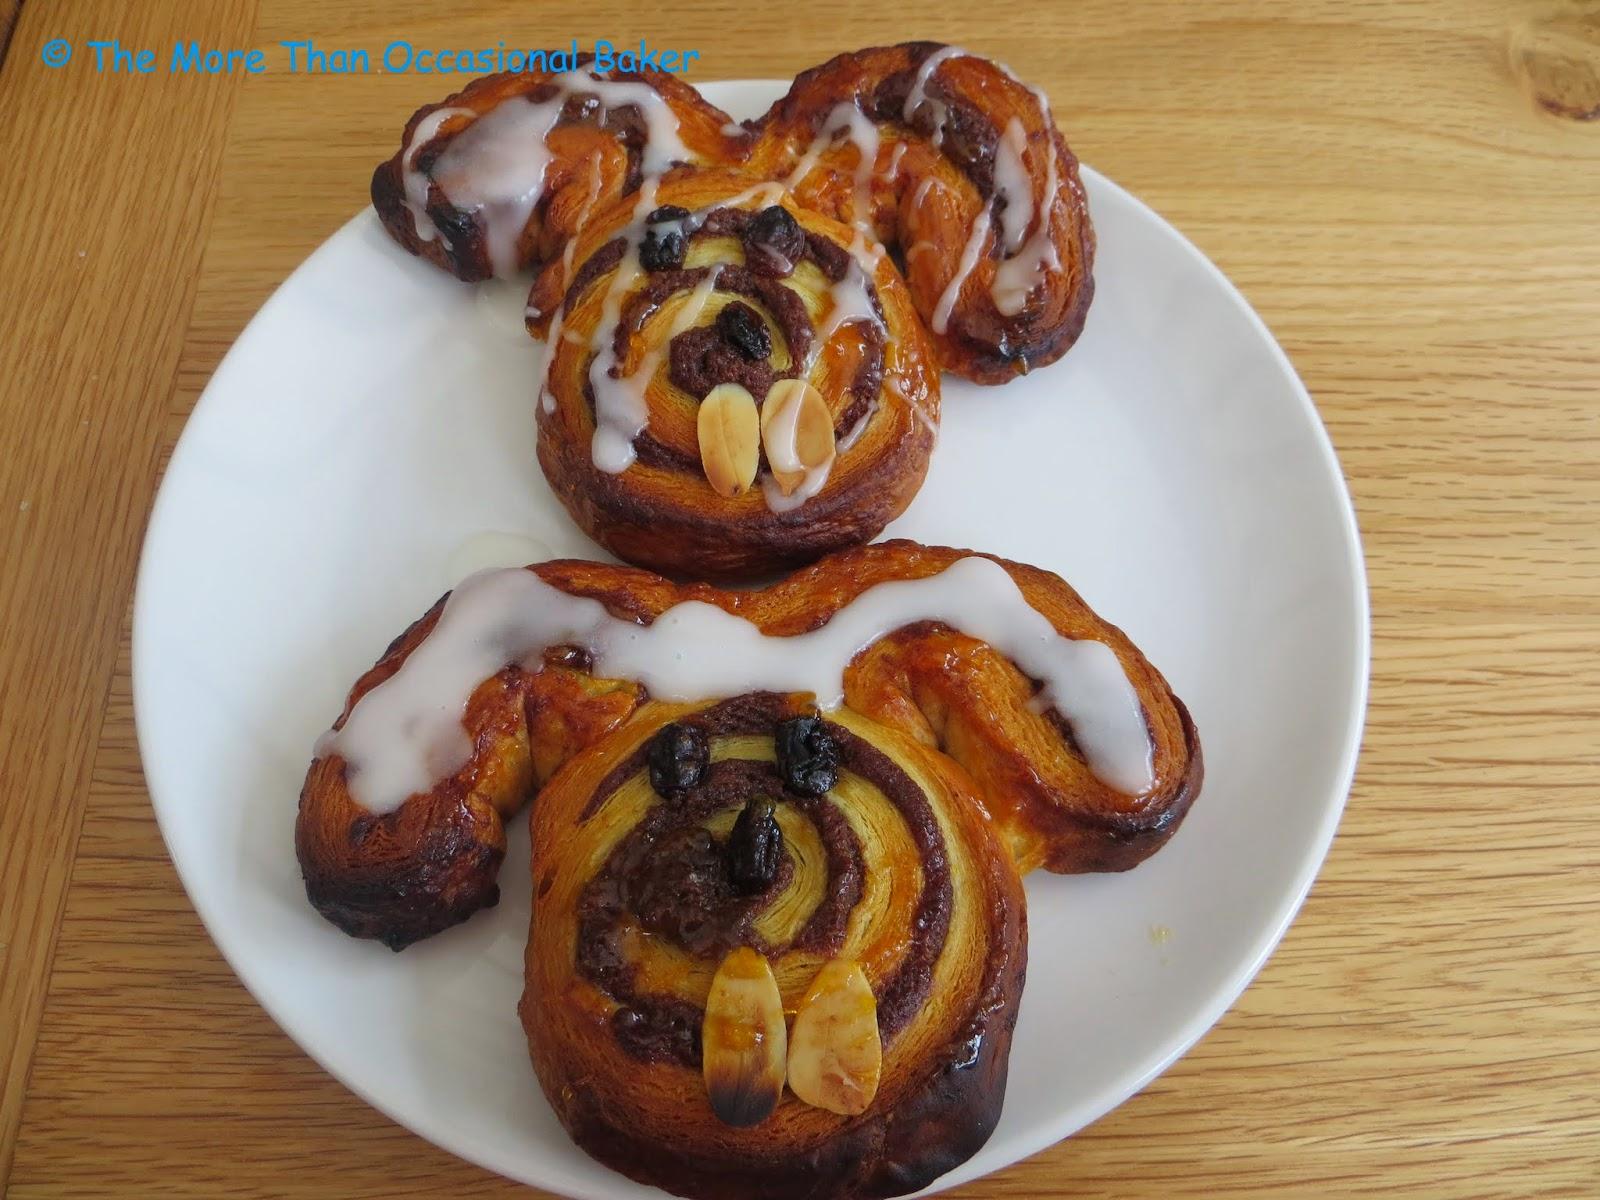 Jus-Rol Cinnamon swirls